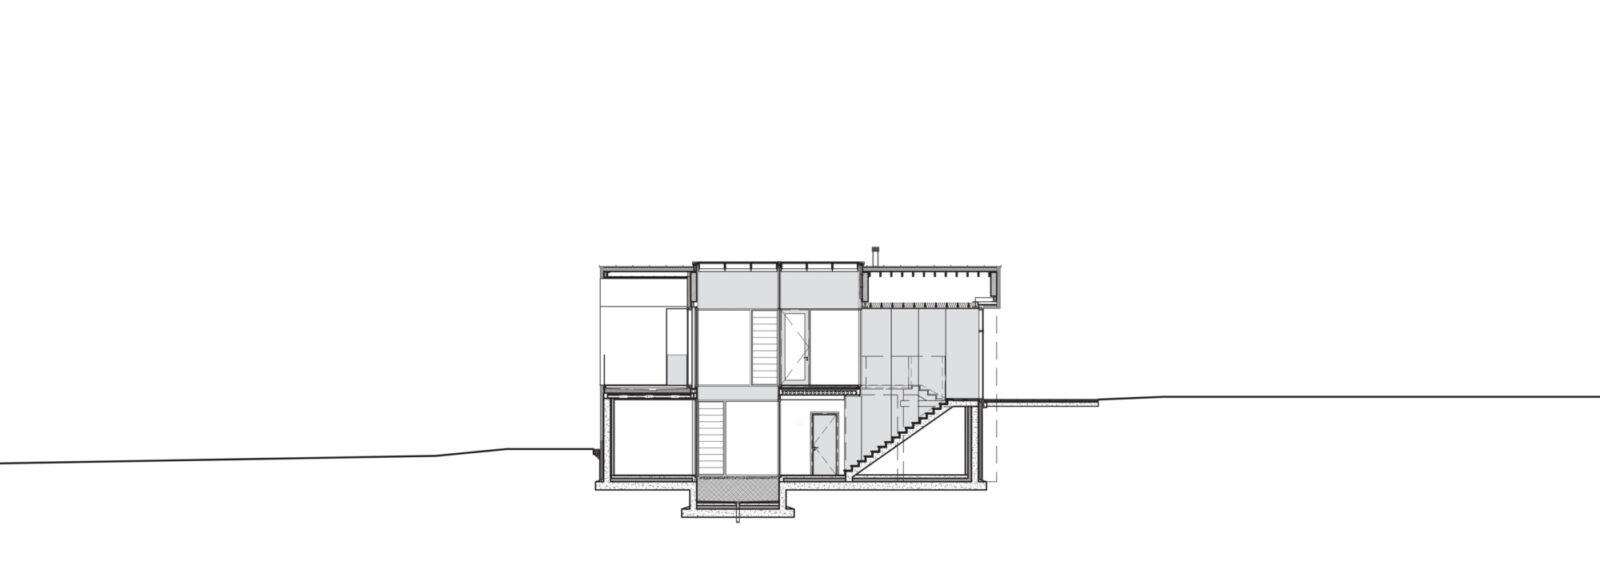 Section B—B